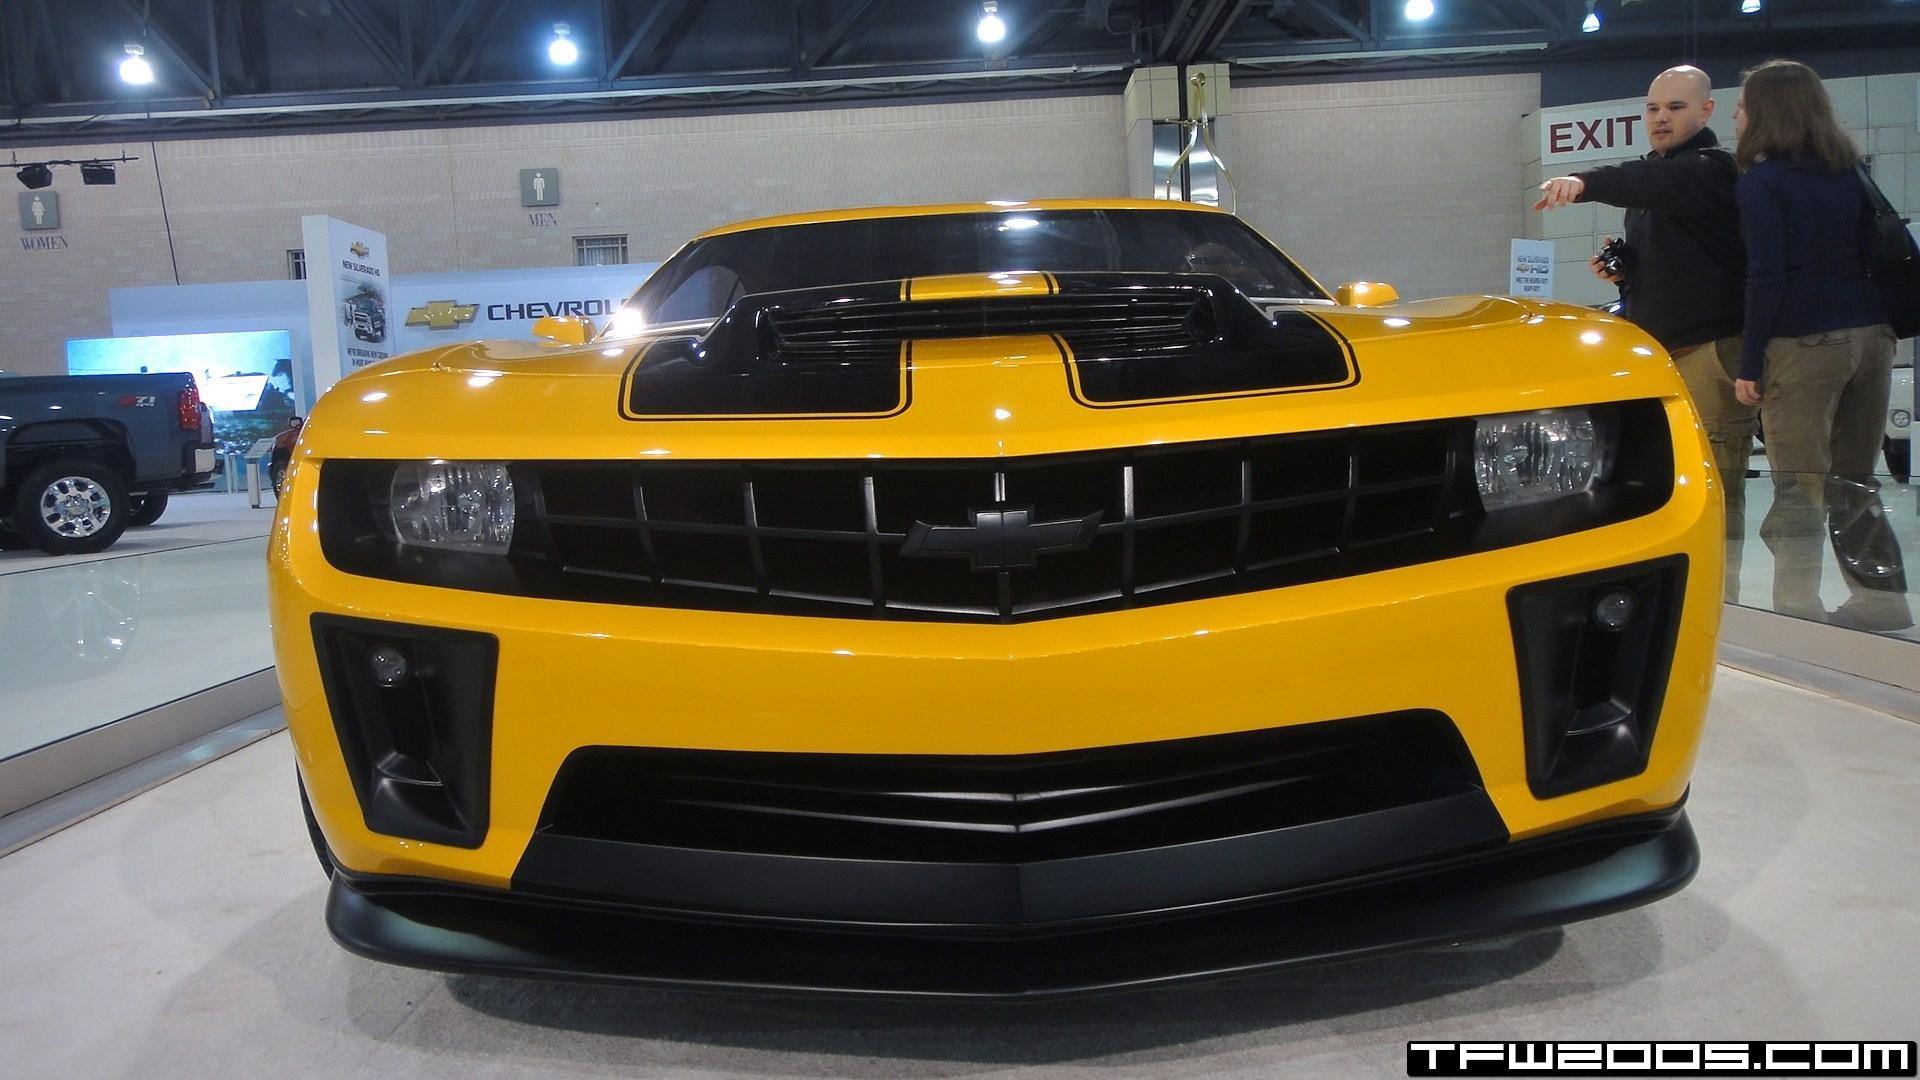 Transformers Movie Bumblebee Camaro Up Close ...